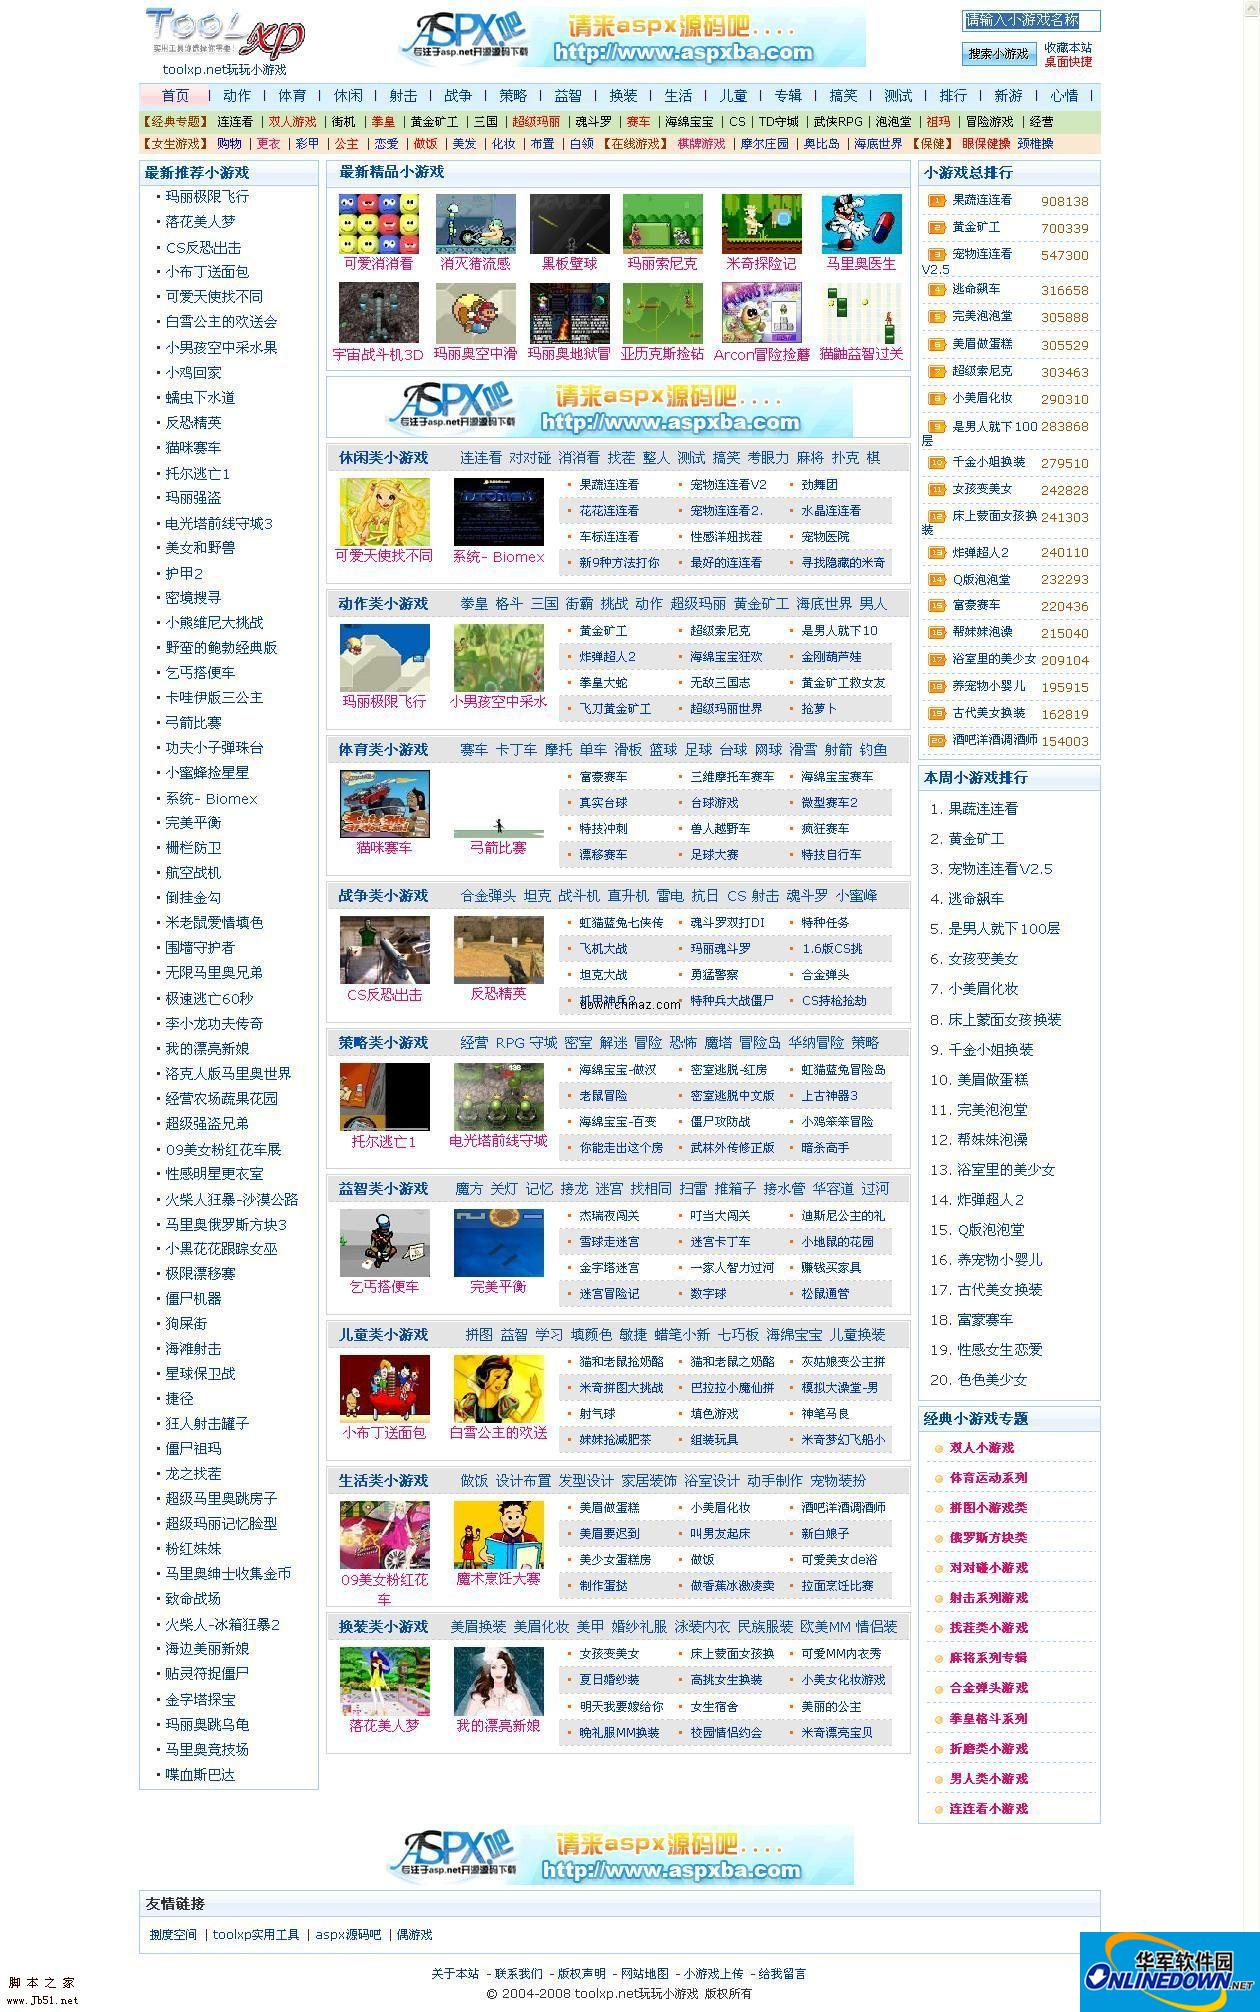 toolxp.net玩玩小游戏 .net2.0版 build 090706